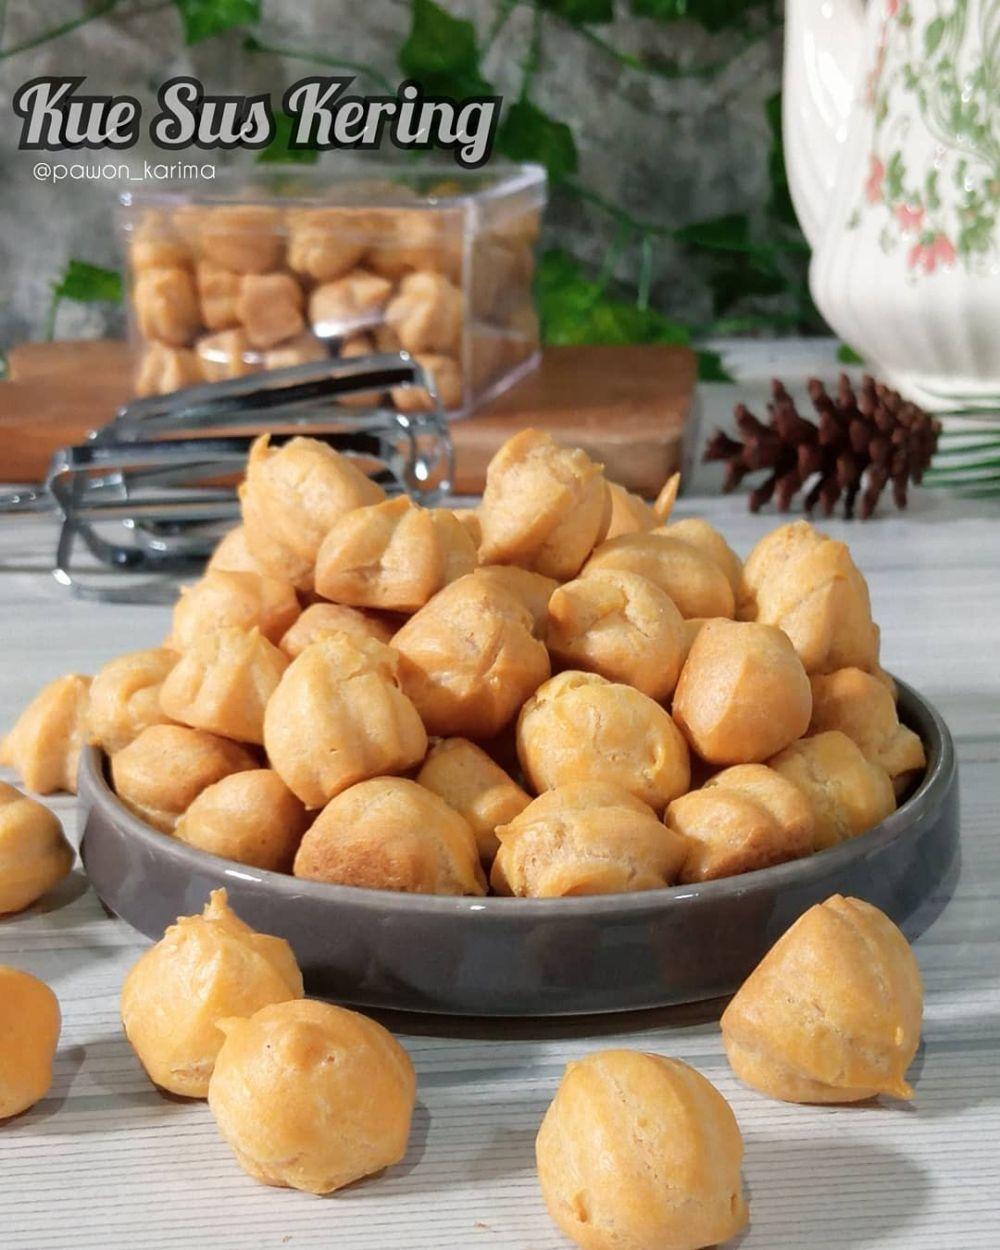 Resep kue sus kering © 2021 brilio.net